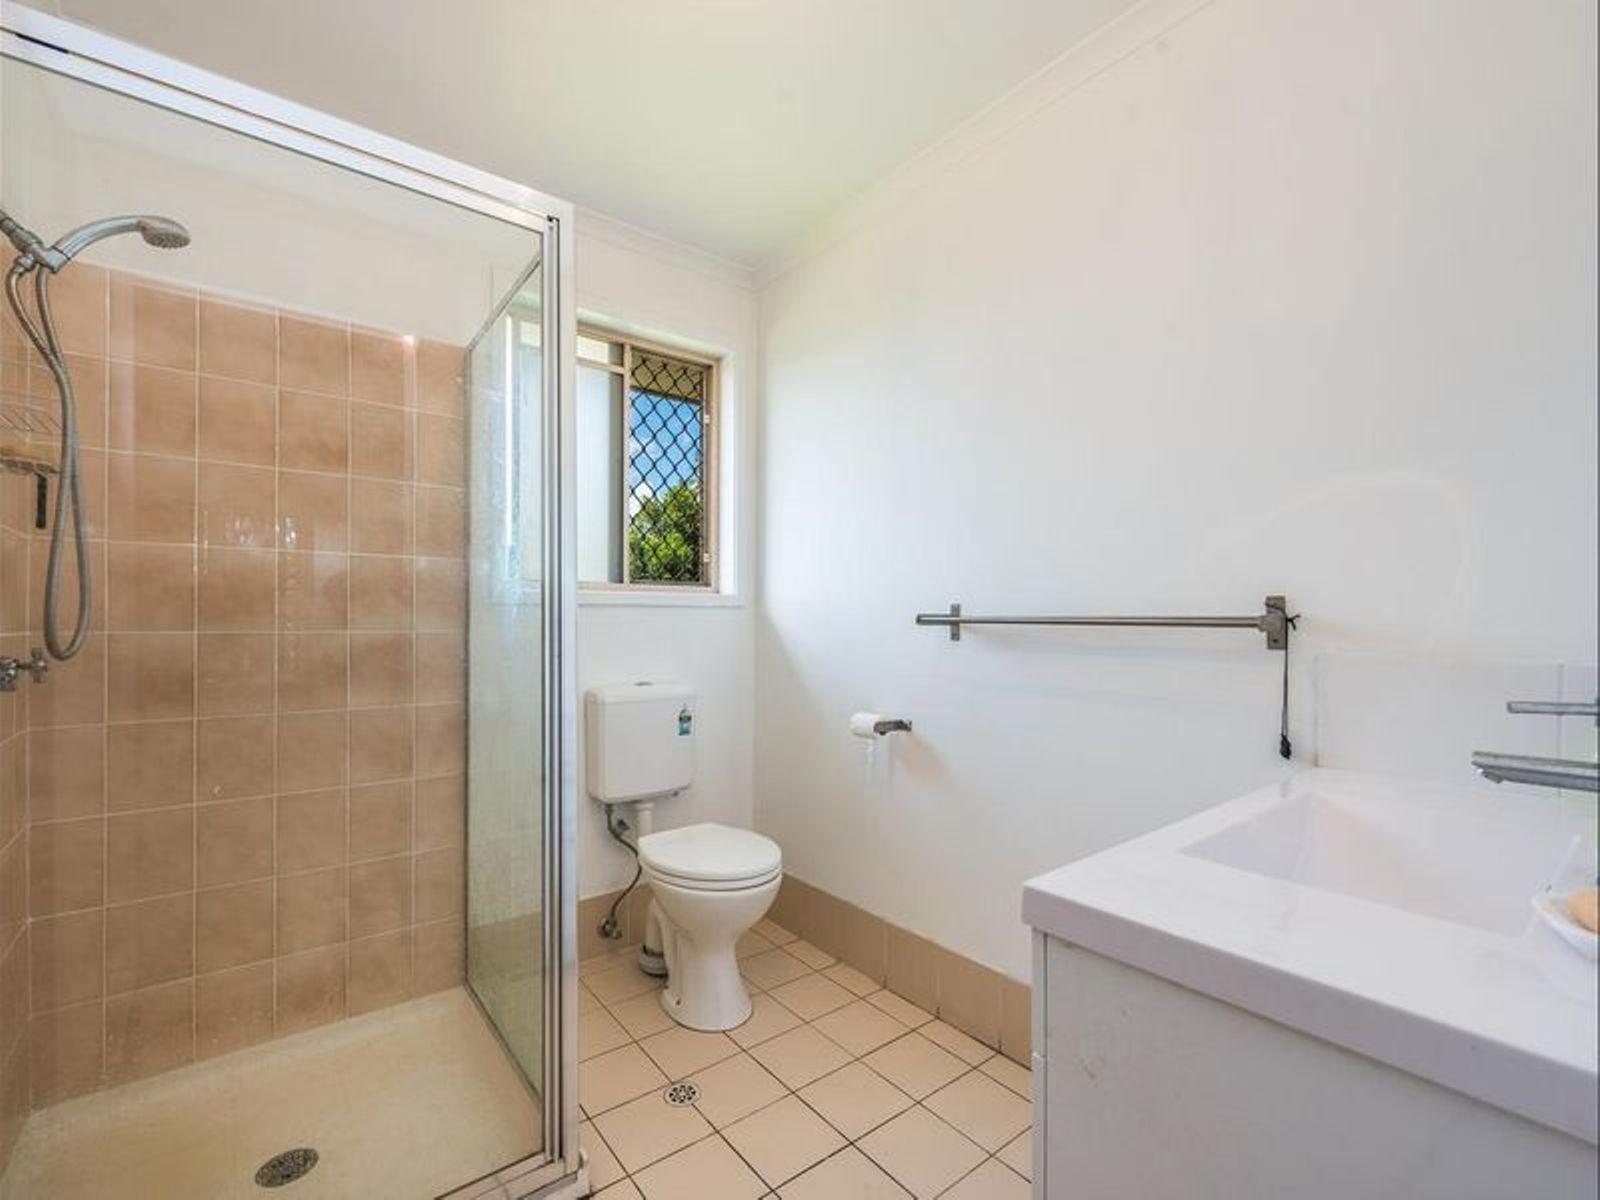 2/19 Bourke Street, Waterford West, QLD 4133